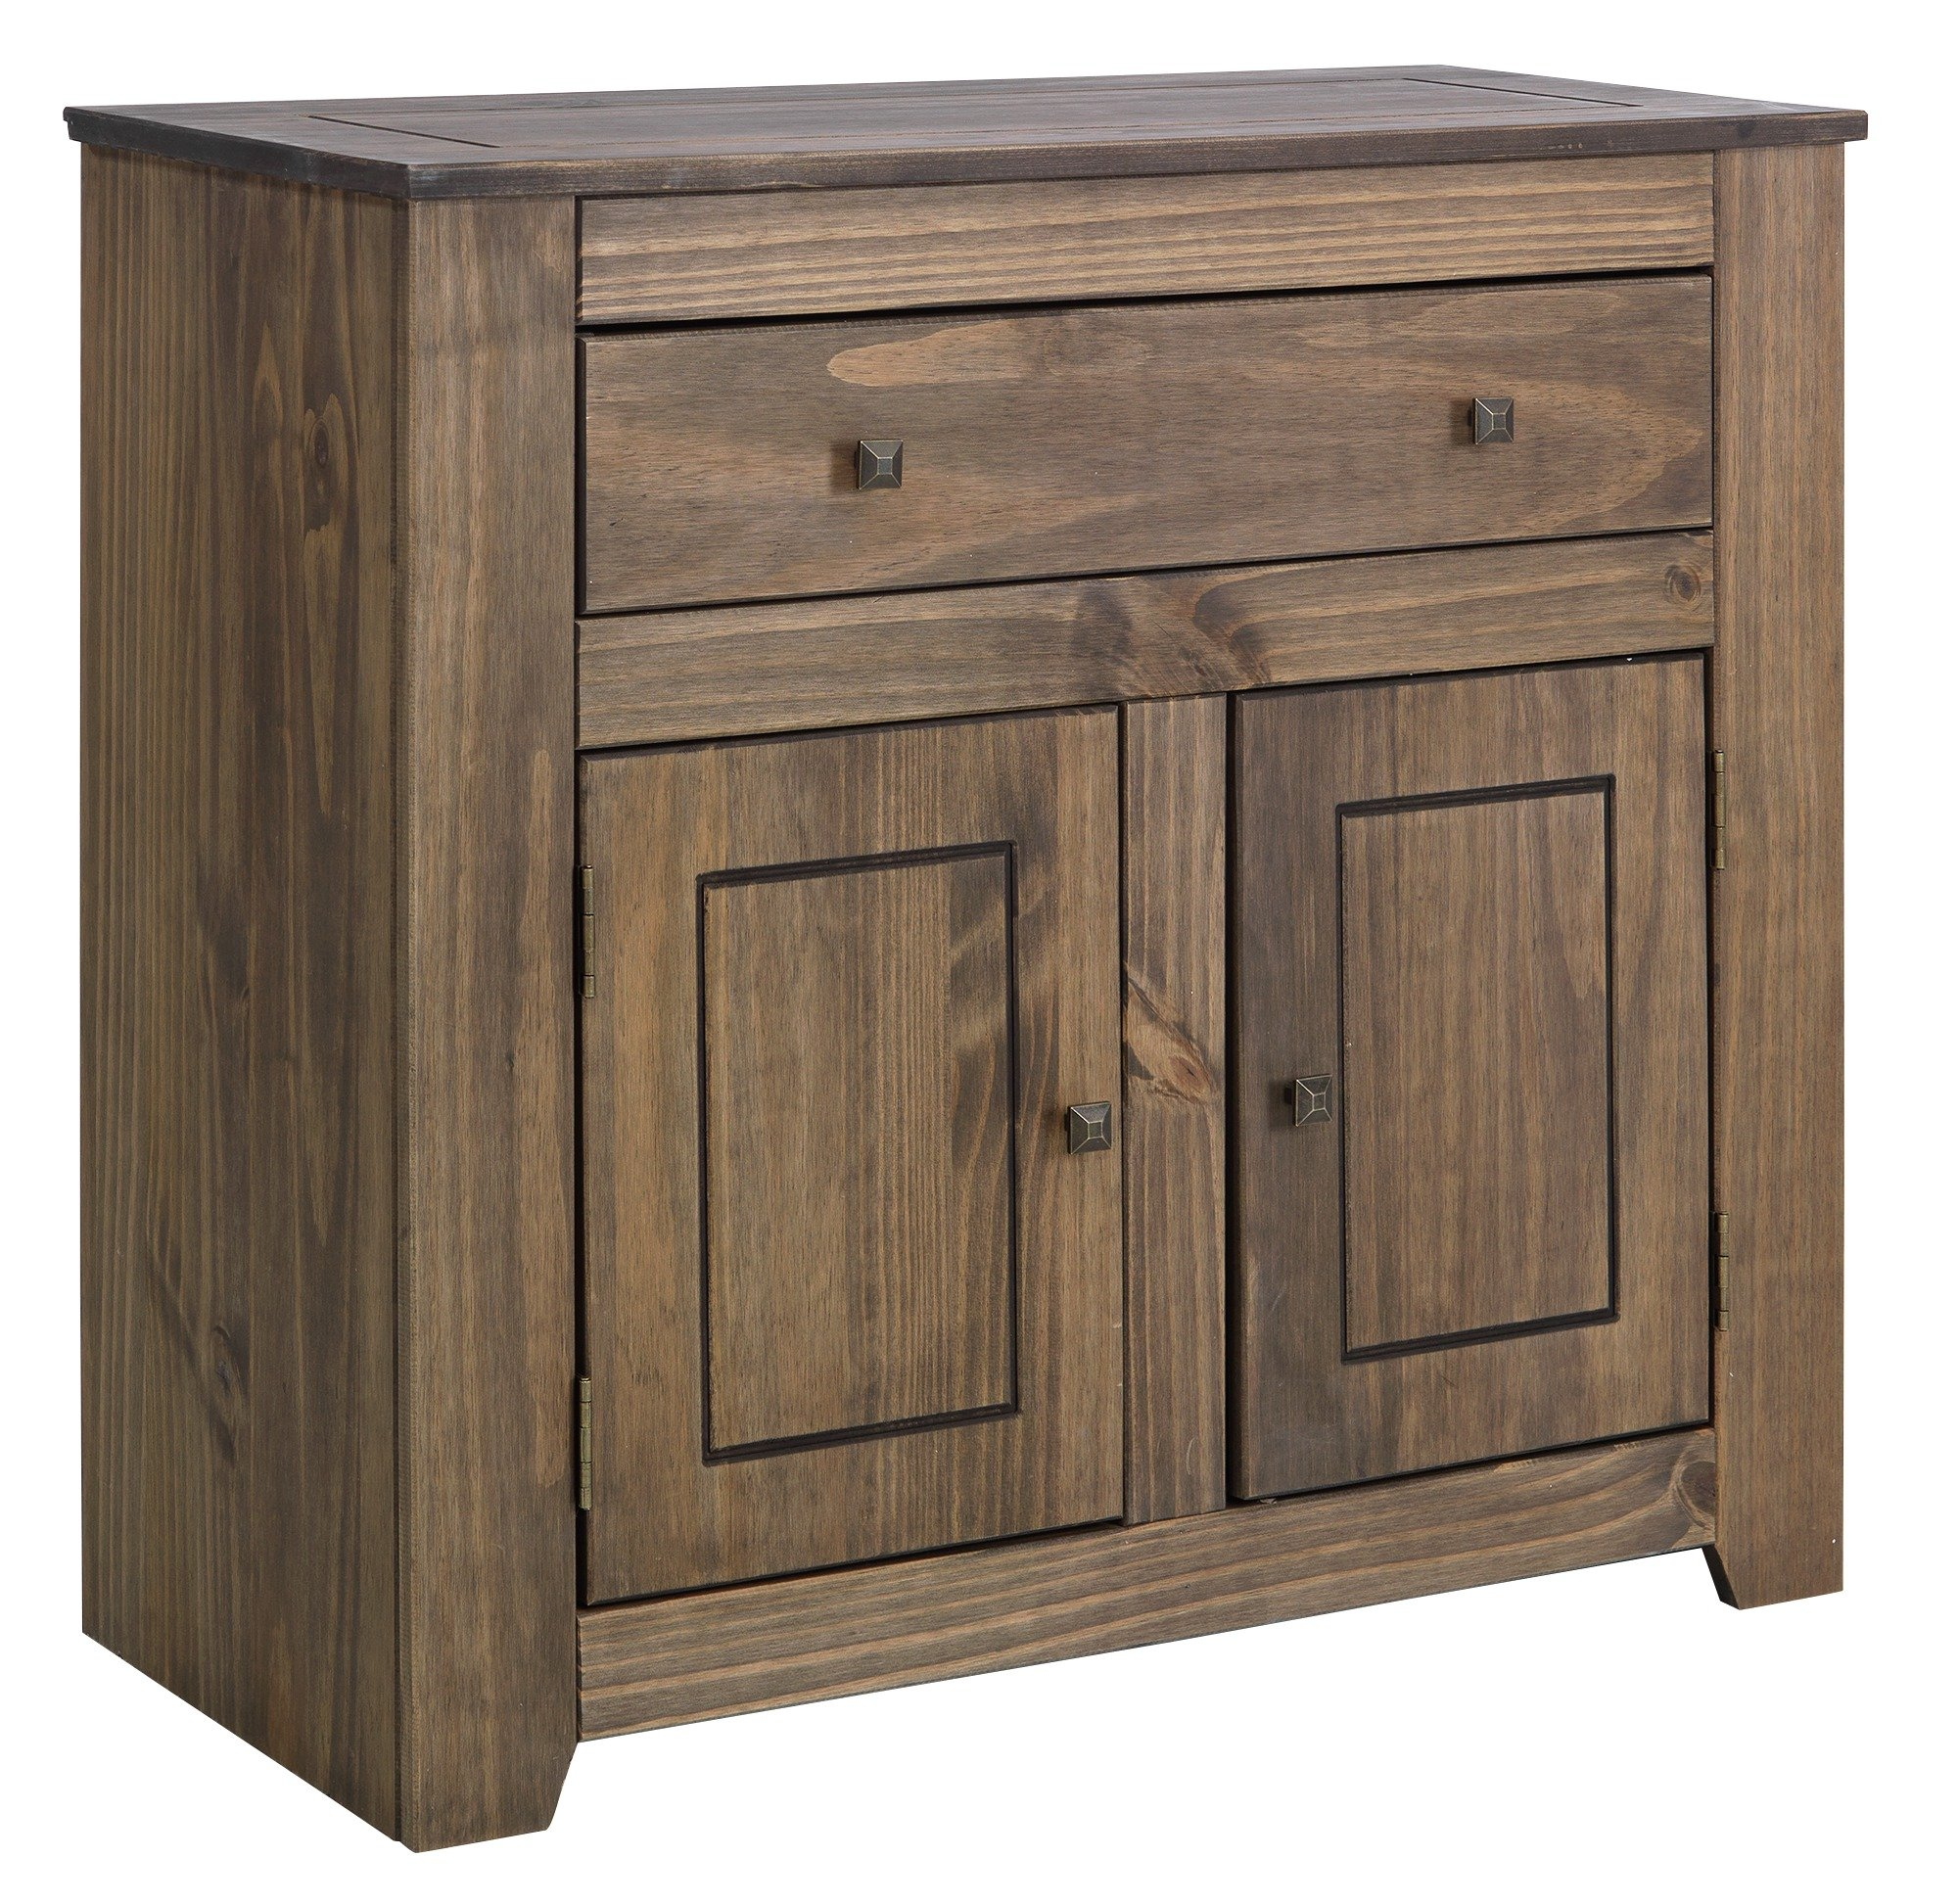 HOME Amersham Small Solid Wood Sideboard - Dark Pine